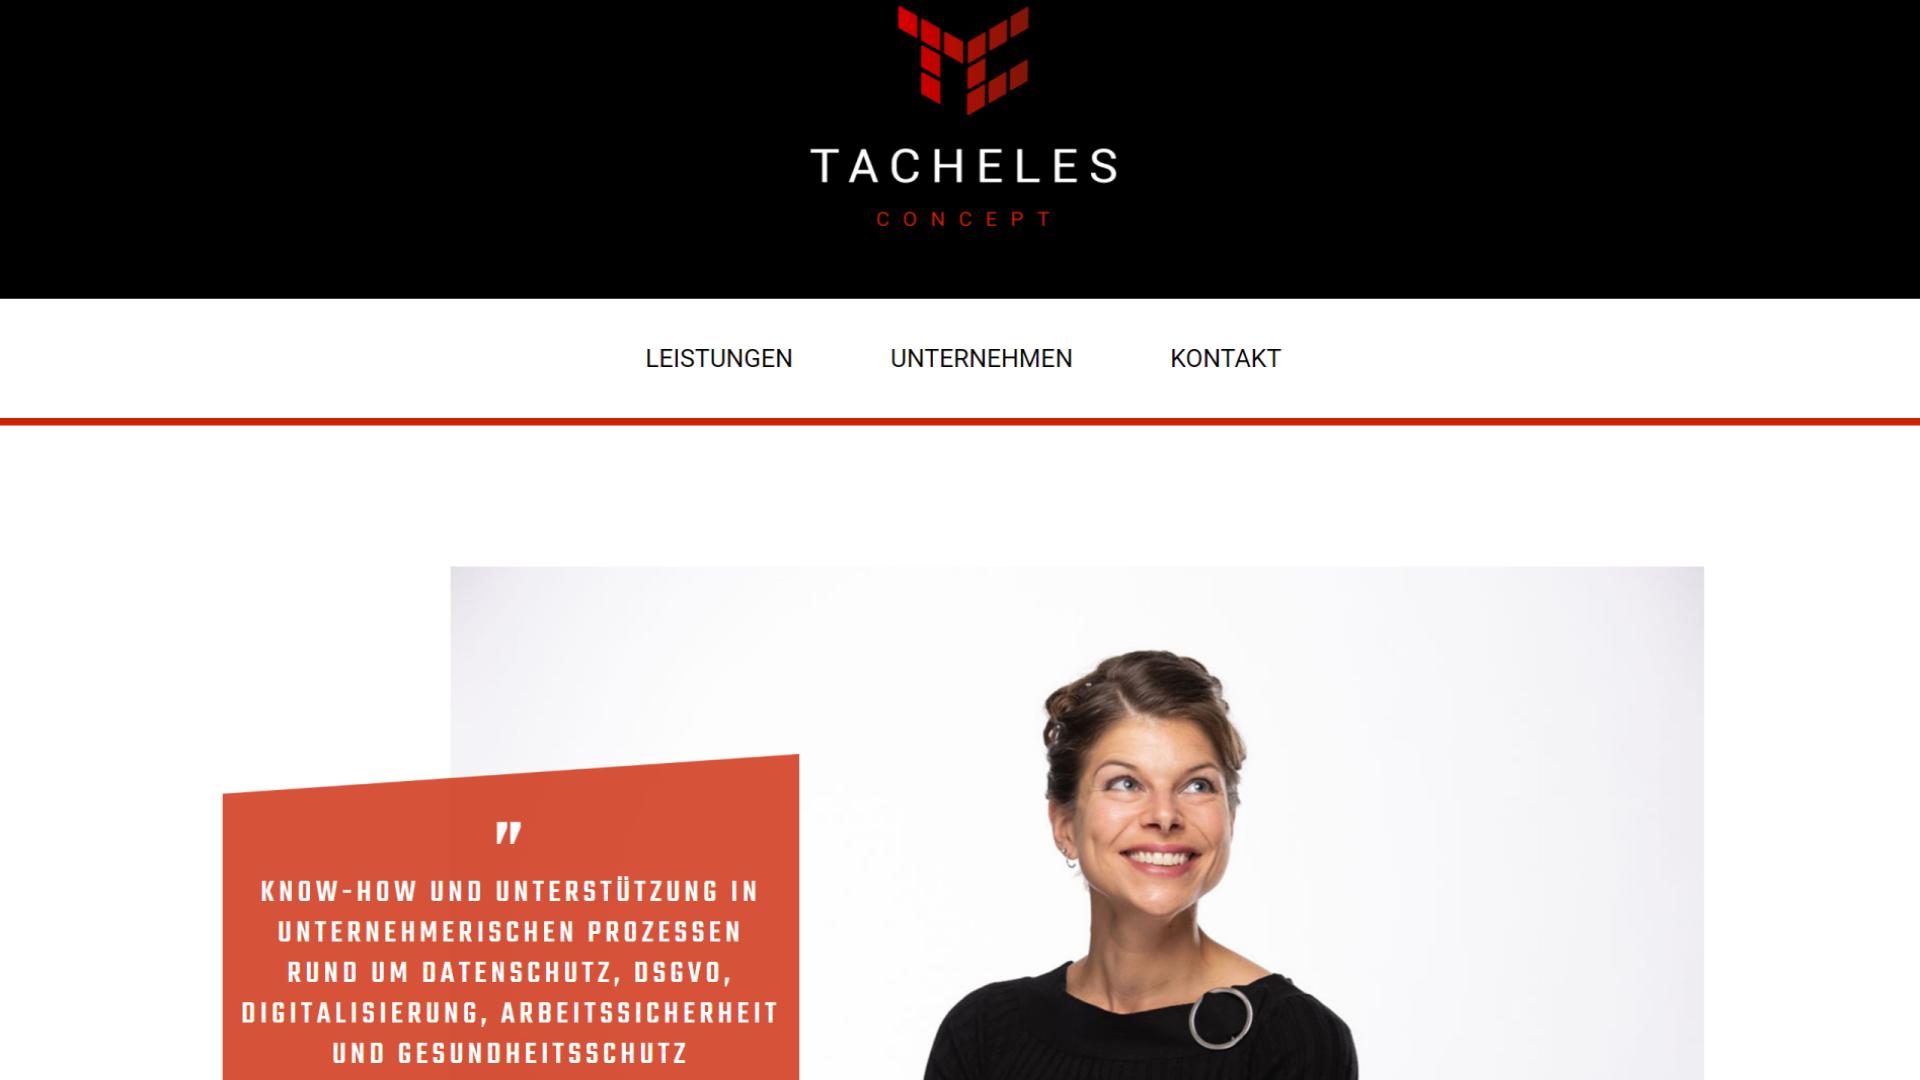 Unternehmen - Tacheles Concept GmbH